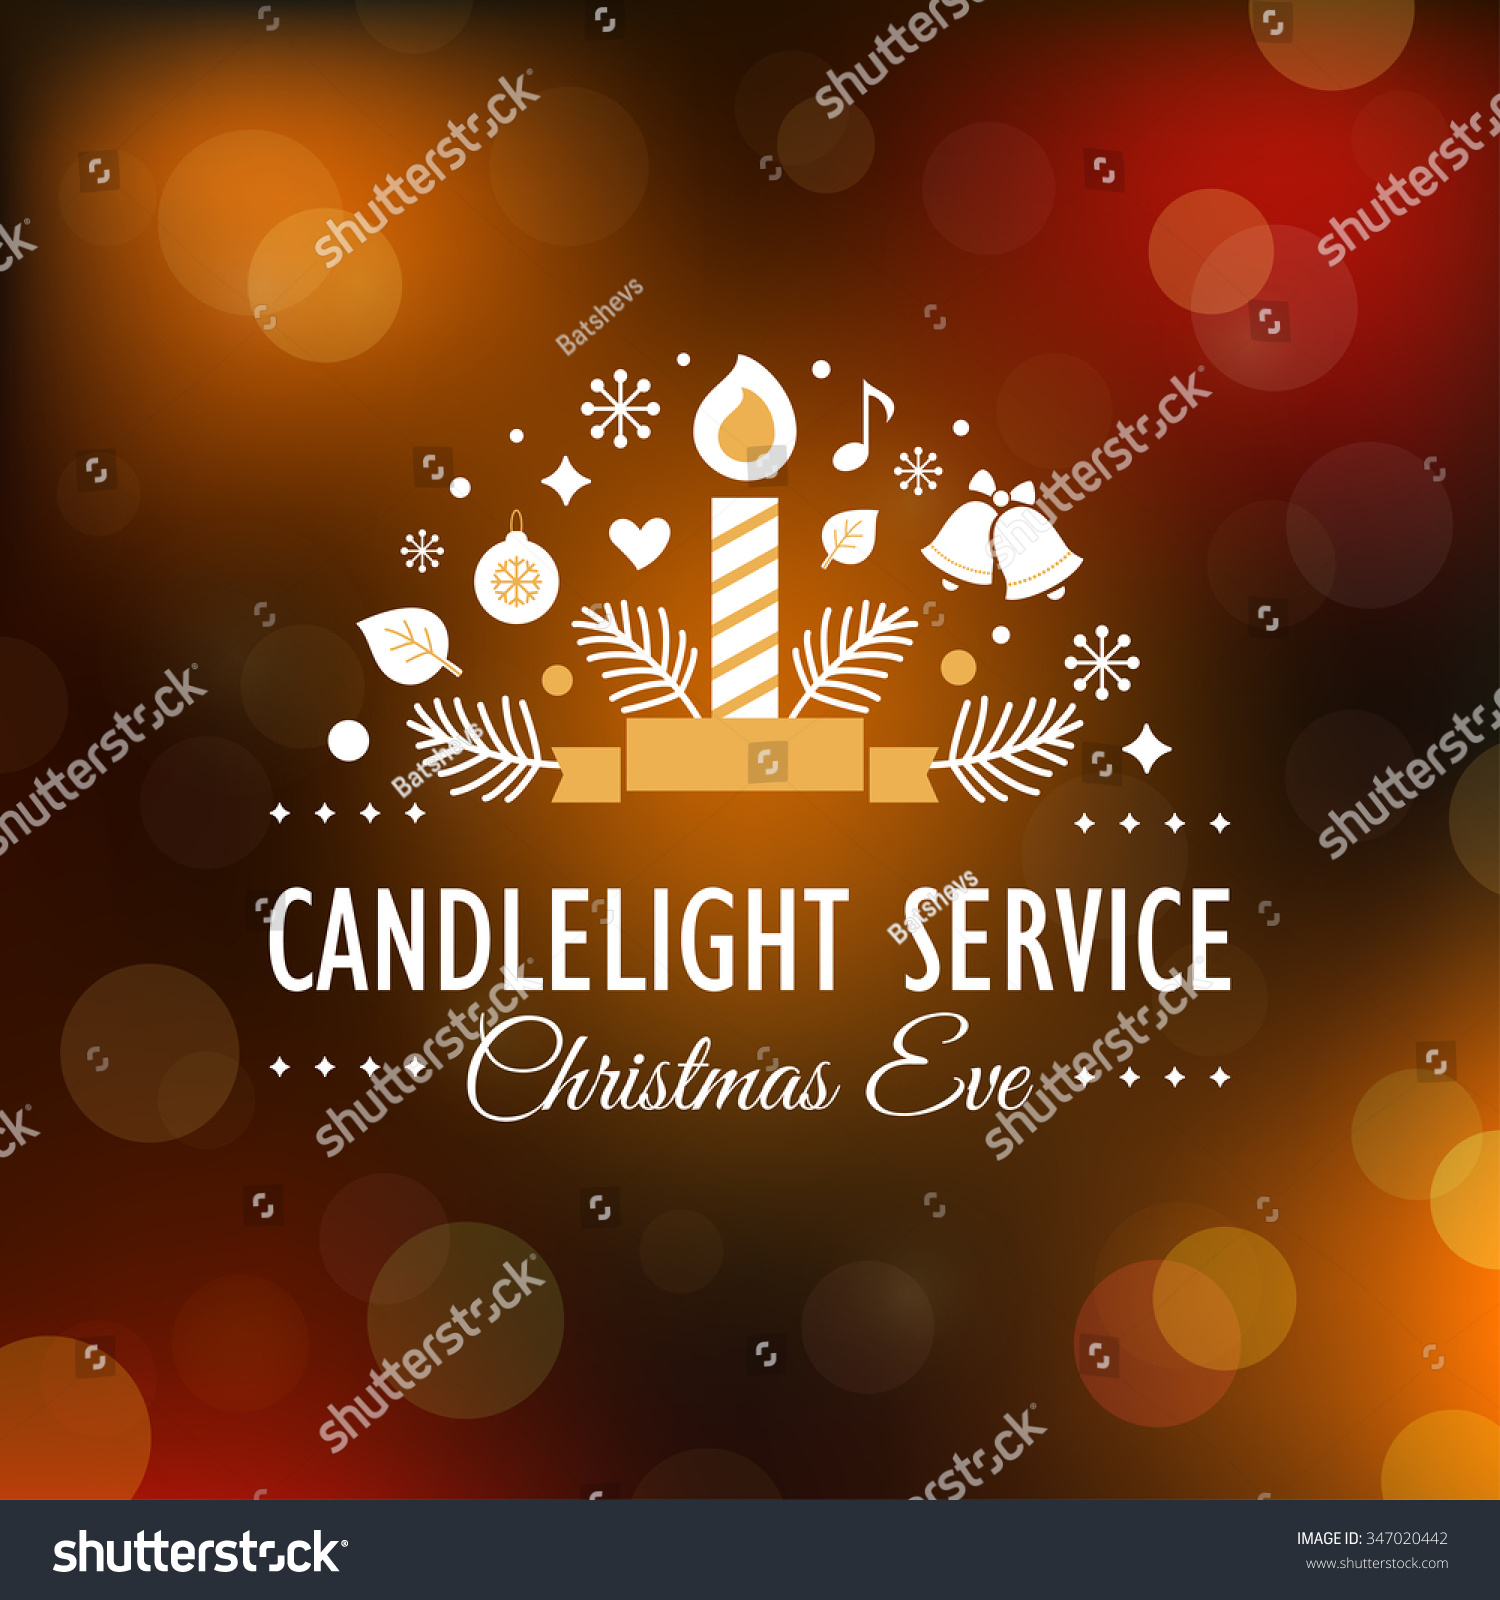 Candlelight service background candlelight service stock photos